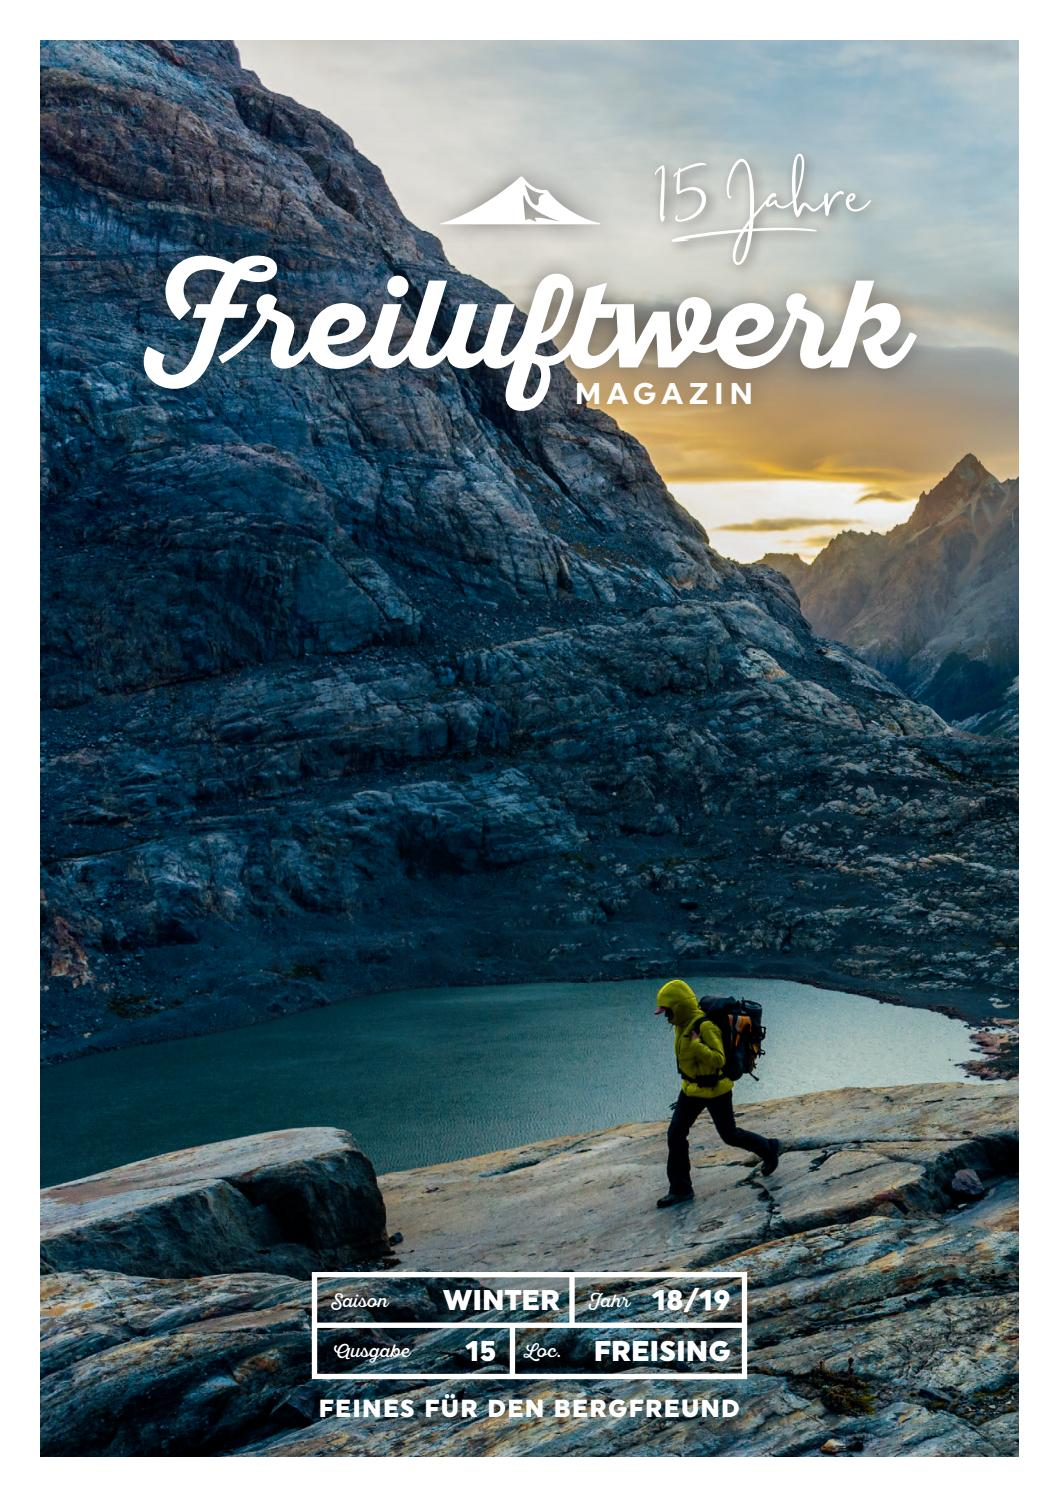 Wandern Handschuhe Camping Ultraleicht Gänsedaunen Skifahren Thermal Winddicht